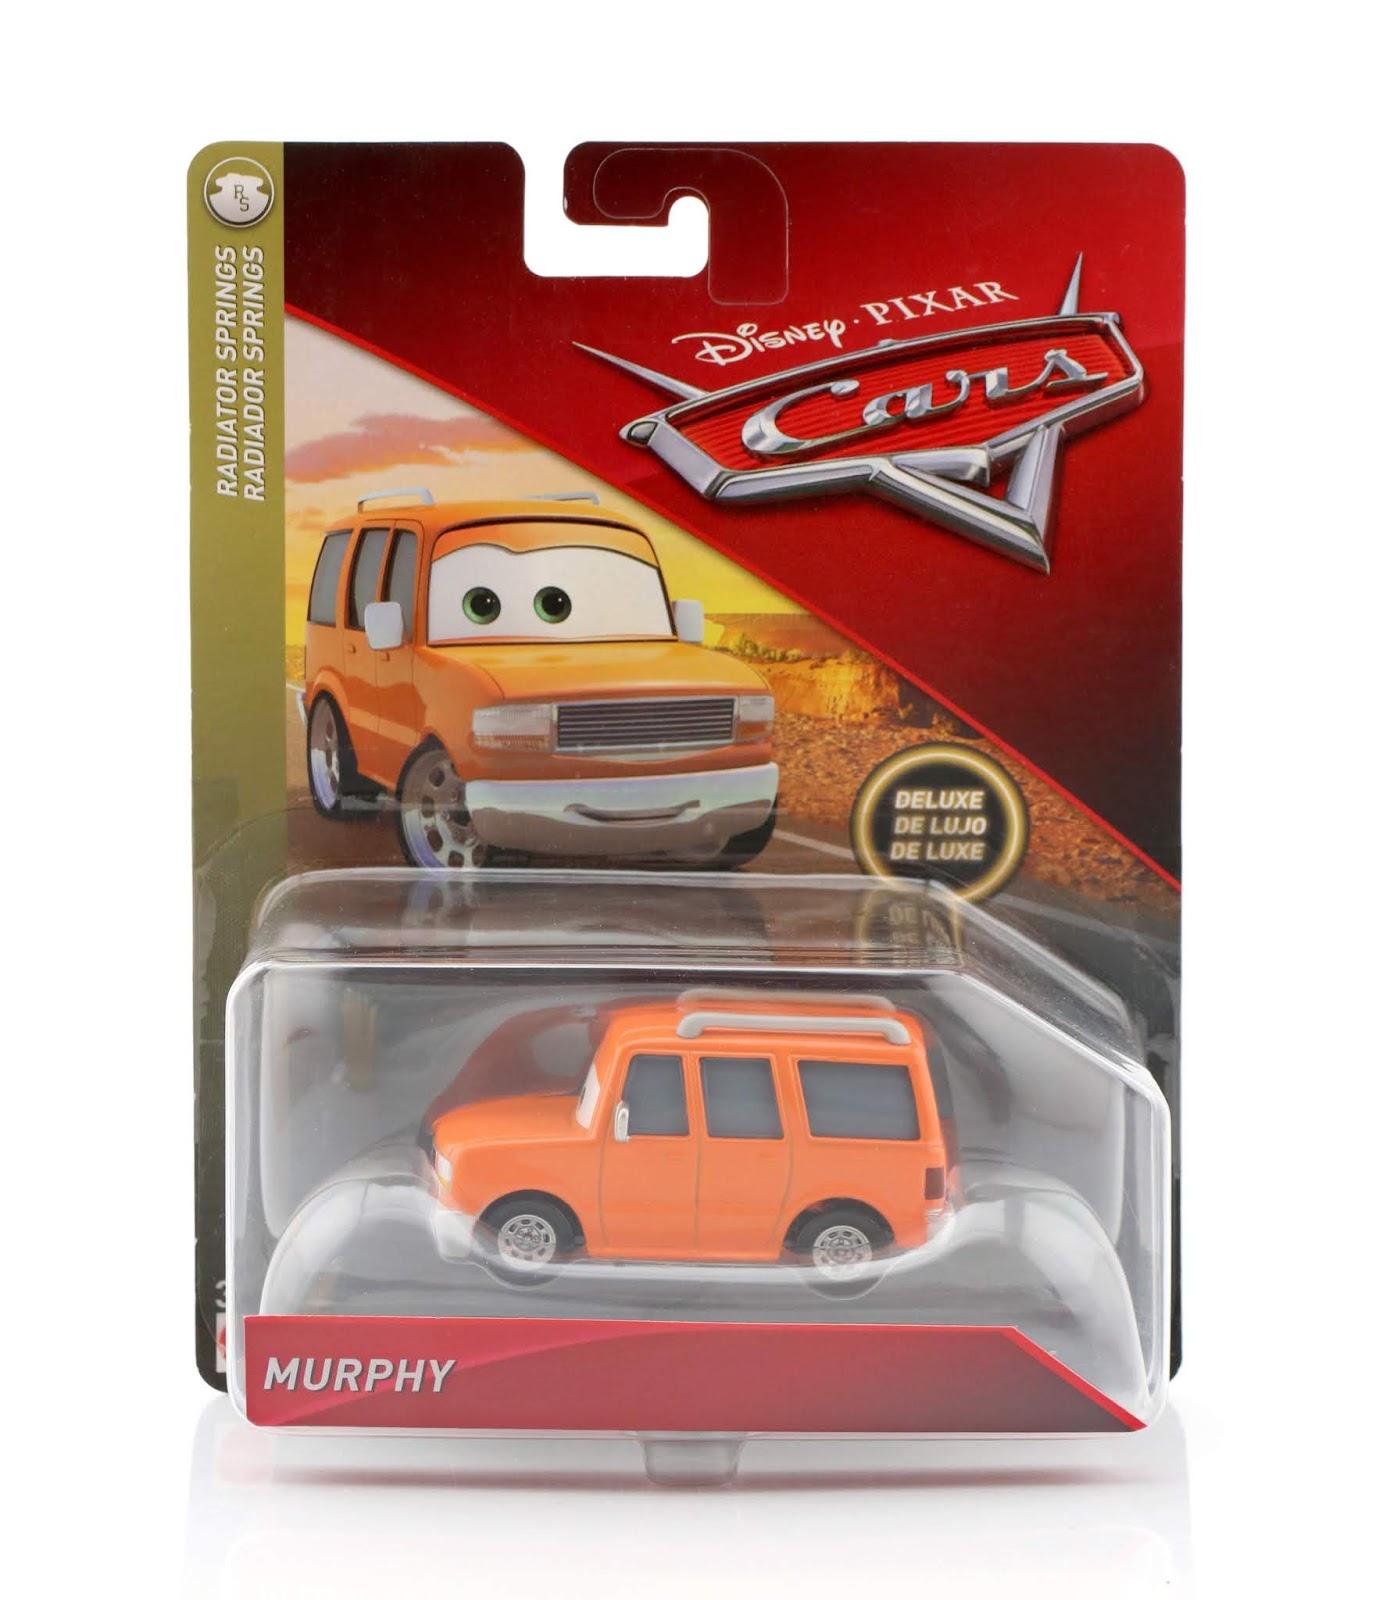 pixar cars murphy diecast review